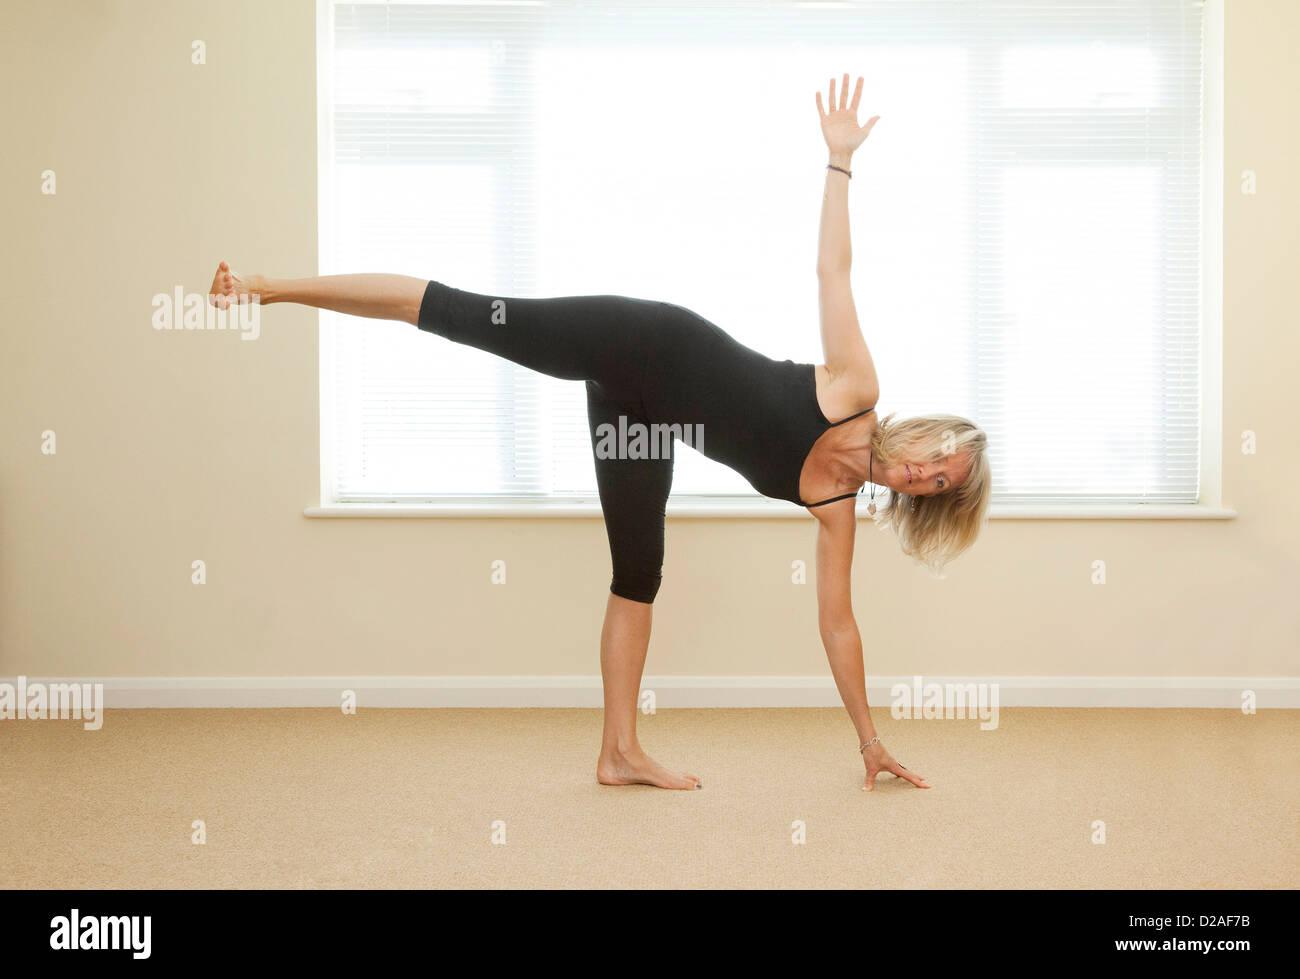 yoga pose - half moon - Stock Image